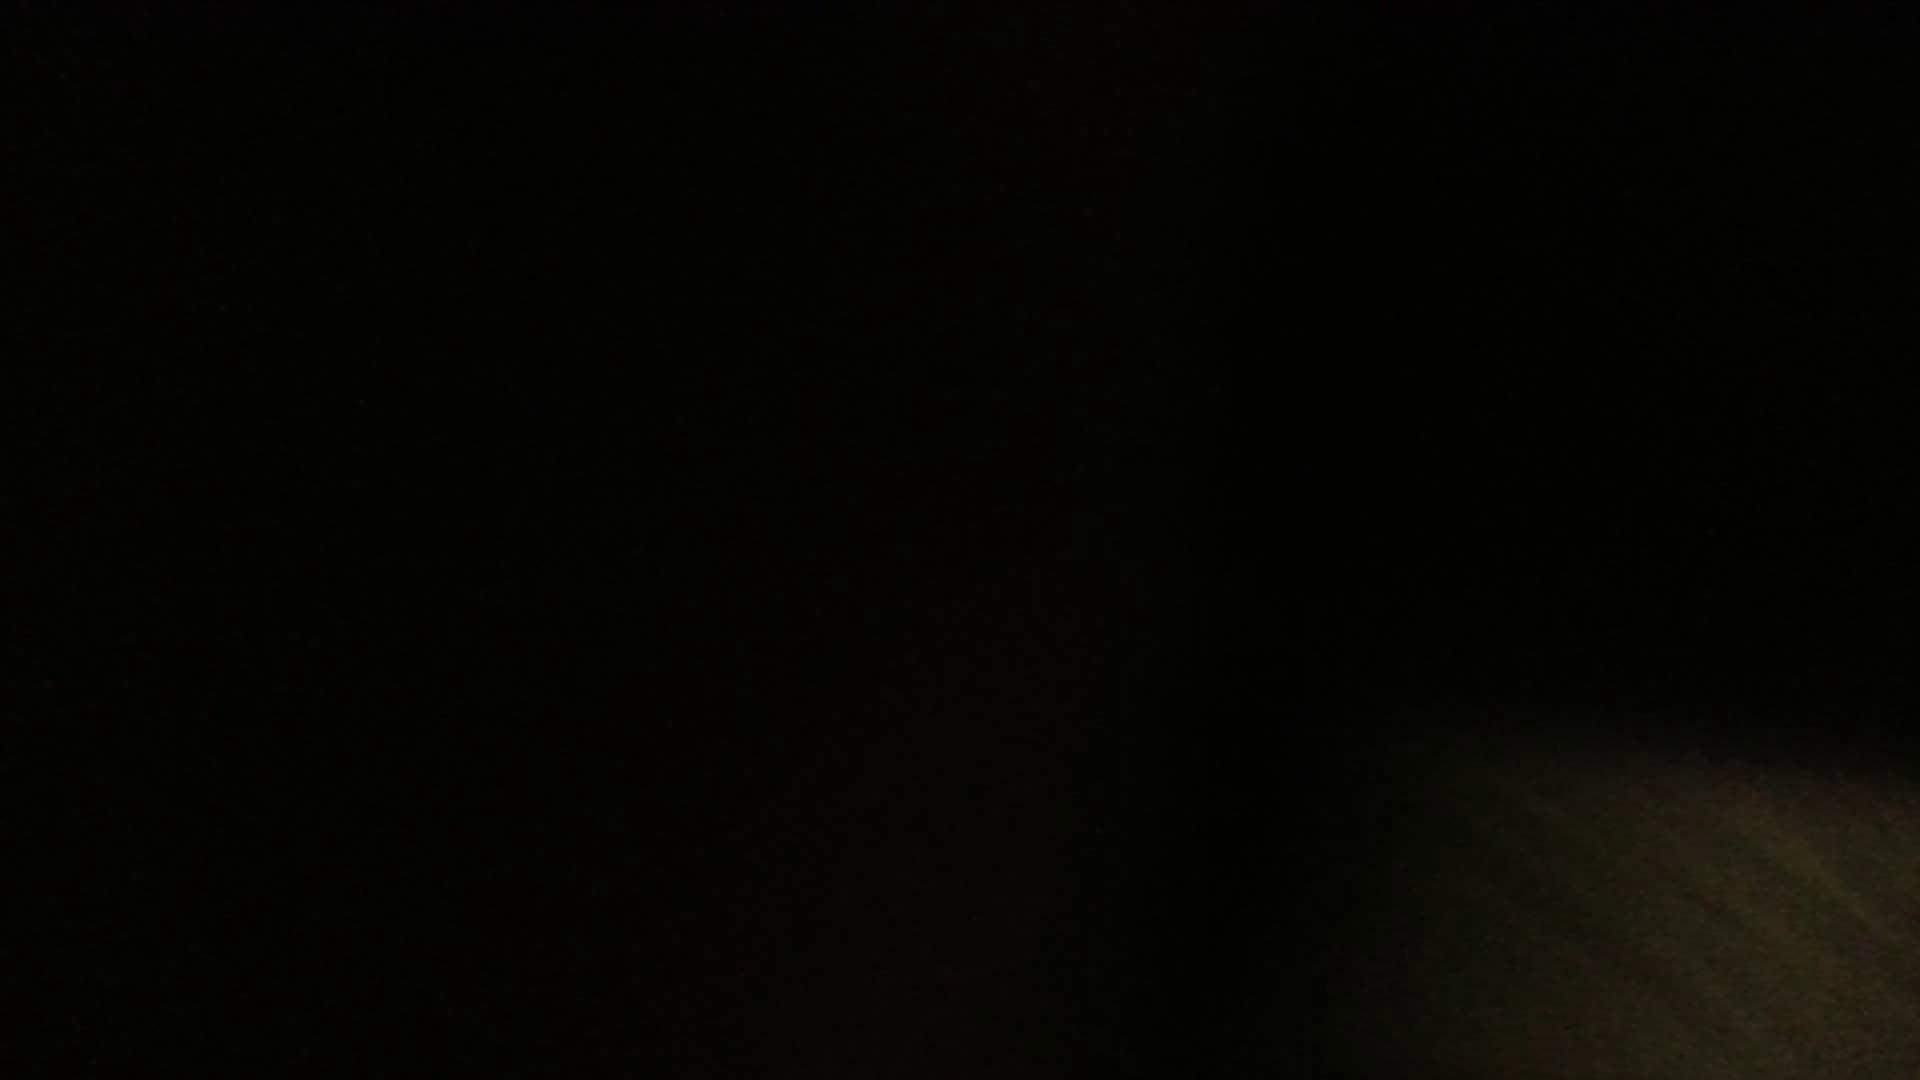 SPYさん初投稿!マンション覗き!5000K!ハイビジョン撮影VOL.03(元野球部社会人編) 完全無修正  109pic 65